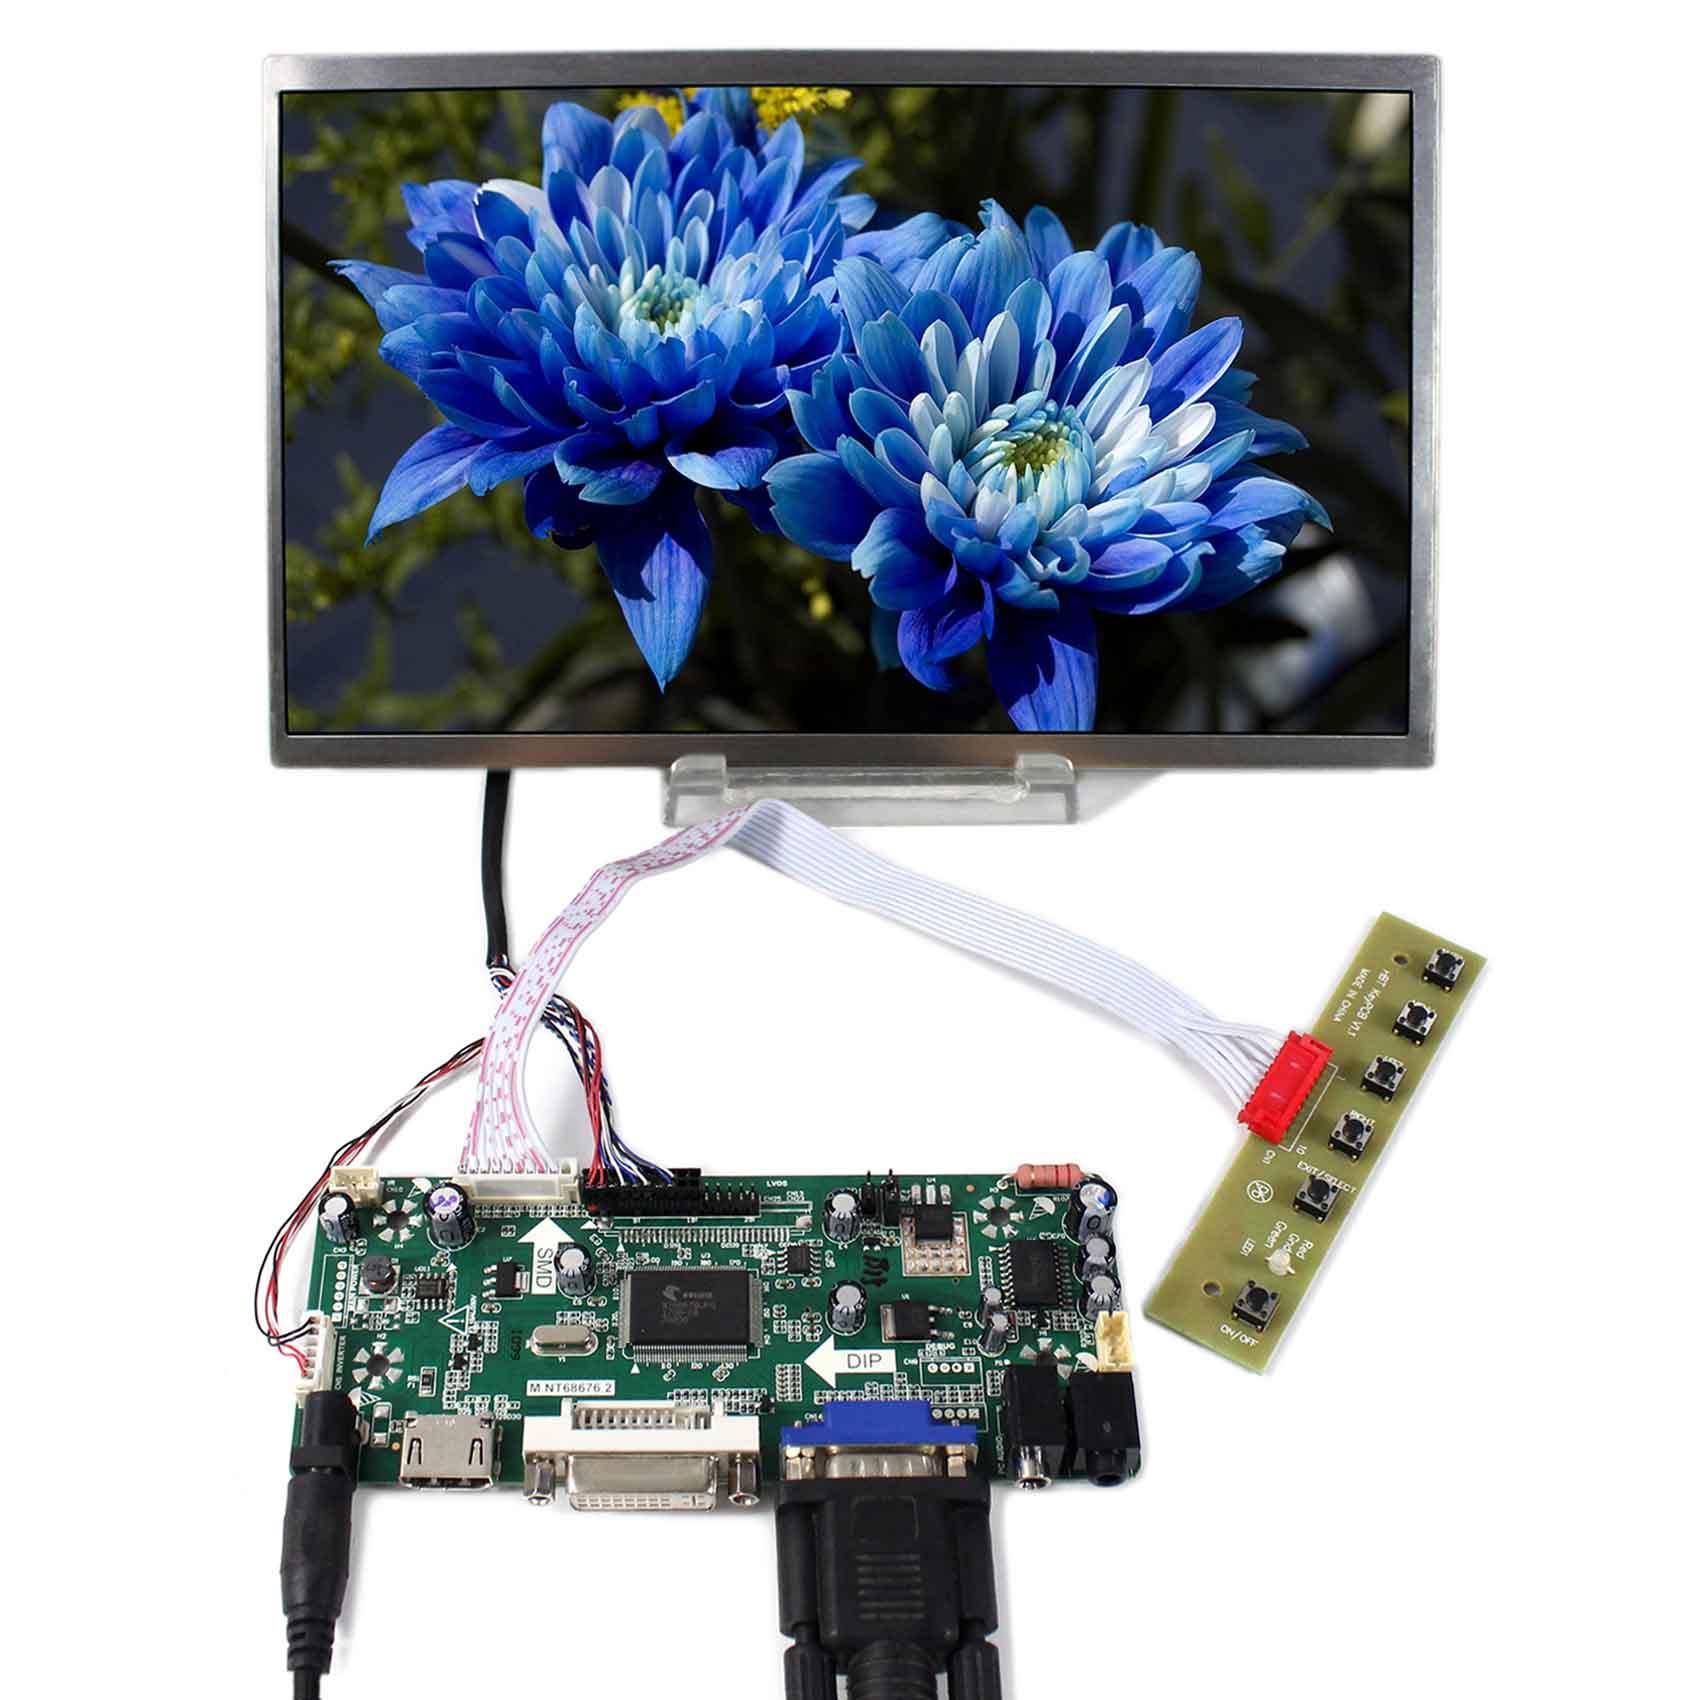 10.1inch 1024x600 HSD101PFW2 B101AW03 BT101IW03 LCD Panel+HDMI LCD Controller Board M.NT6867610.1inch 1024x600 HSD101PFW2 B101AW03 BT101IW03 LCD Panel+HDMI LCD Controller Board M.NT68676